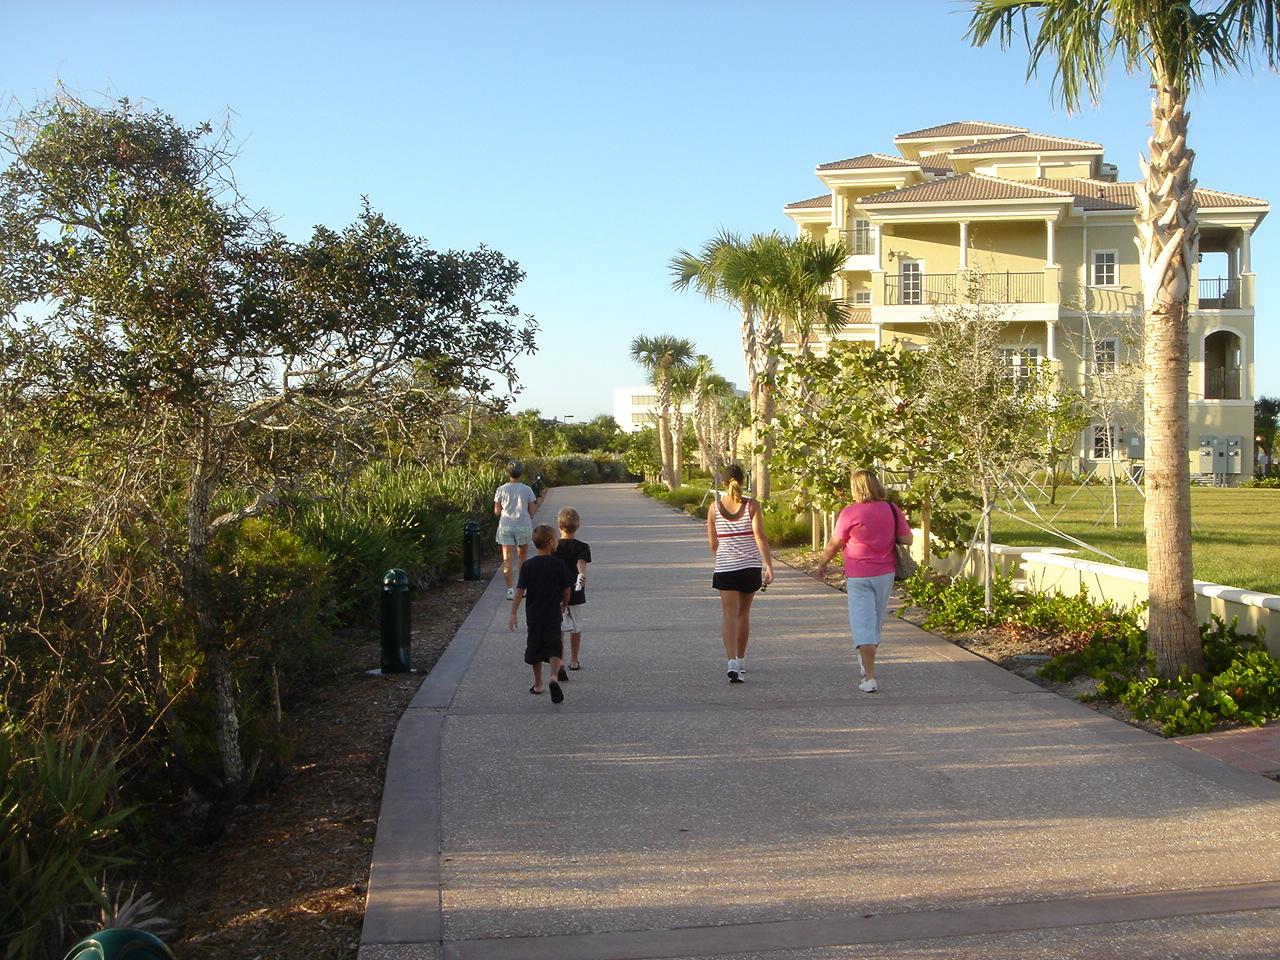 Tierra Del Sol Jupiter Florida Riverwalk Walking Trail.JPG